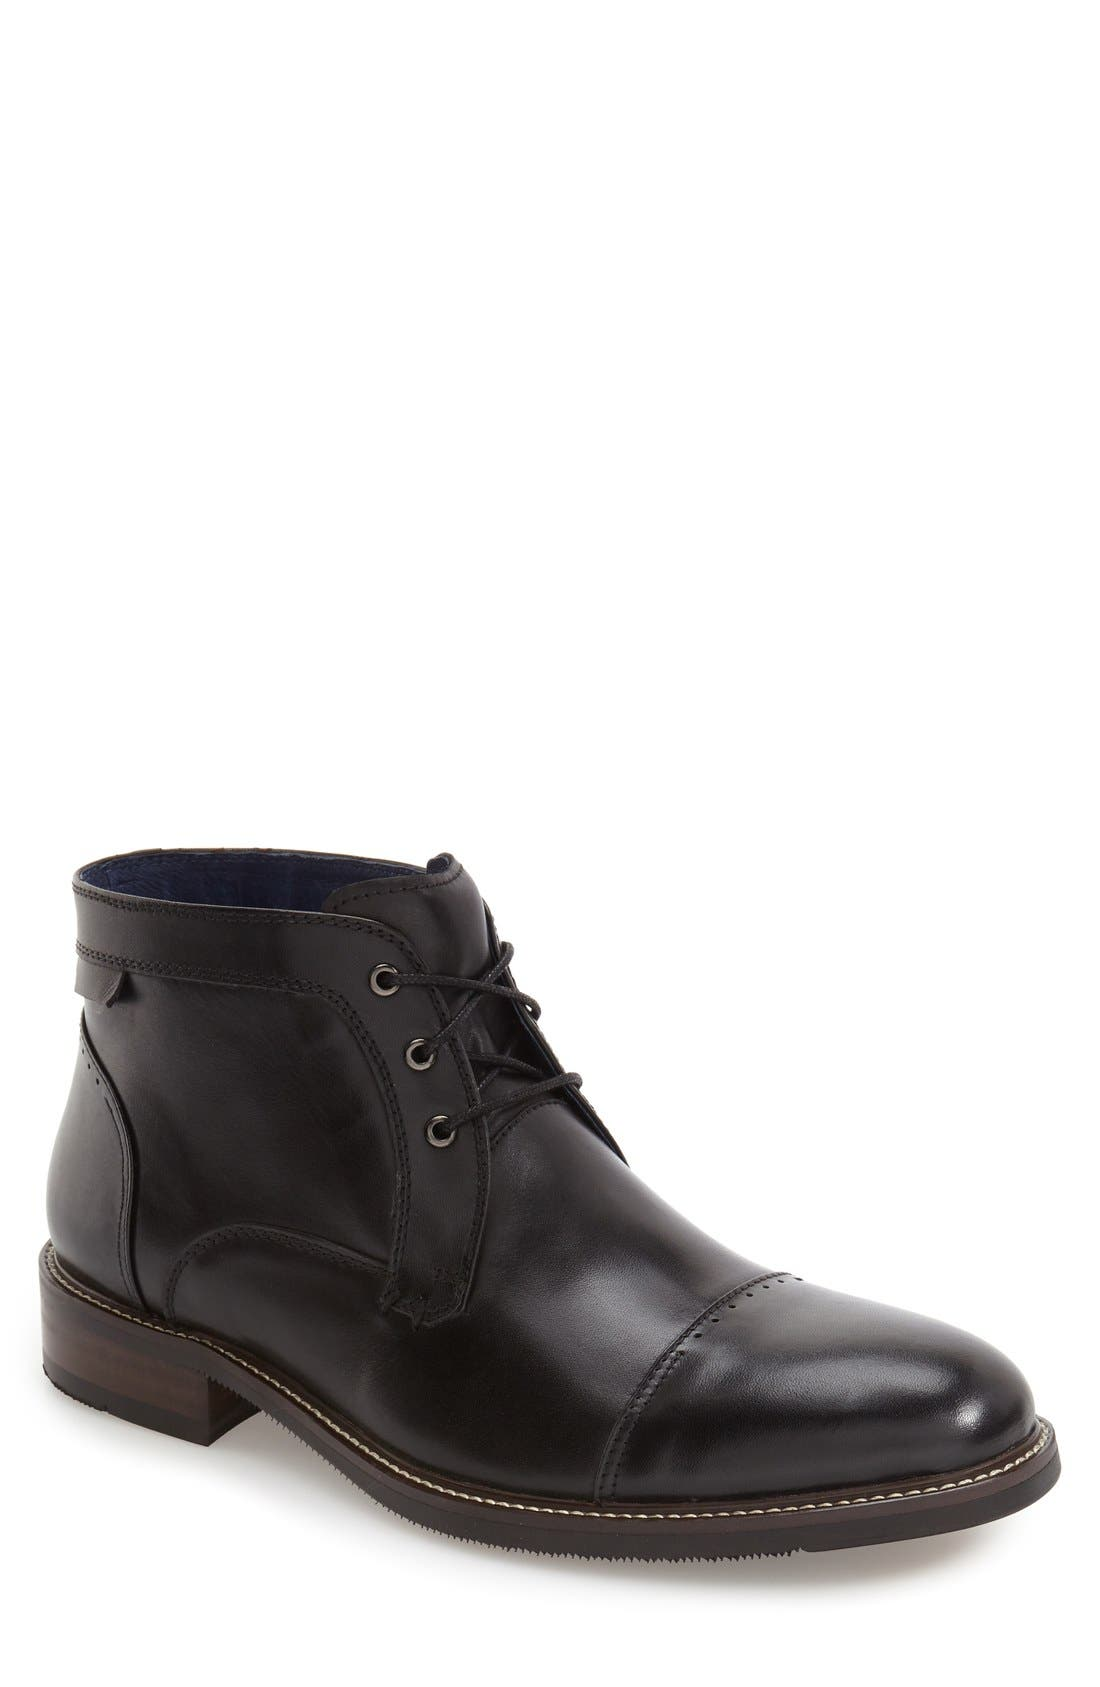 'Rubano' Chukka Boot,                         Main,                         color, 001